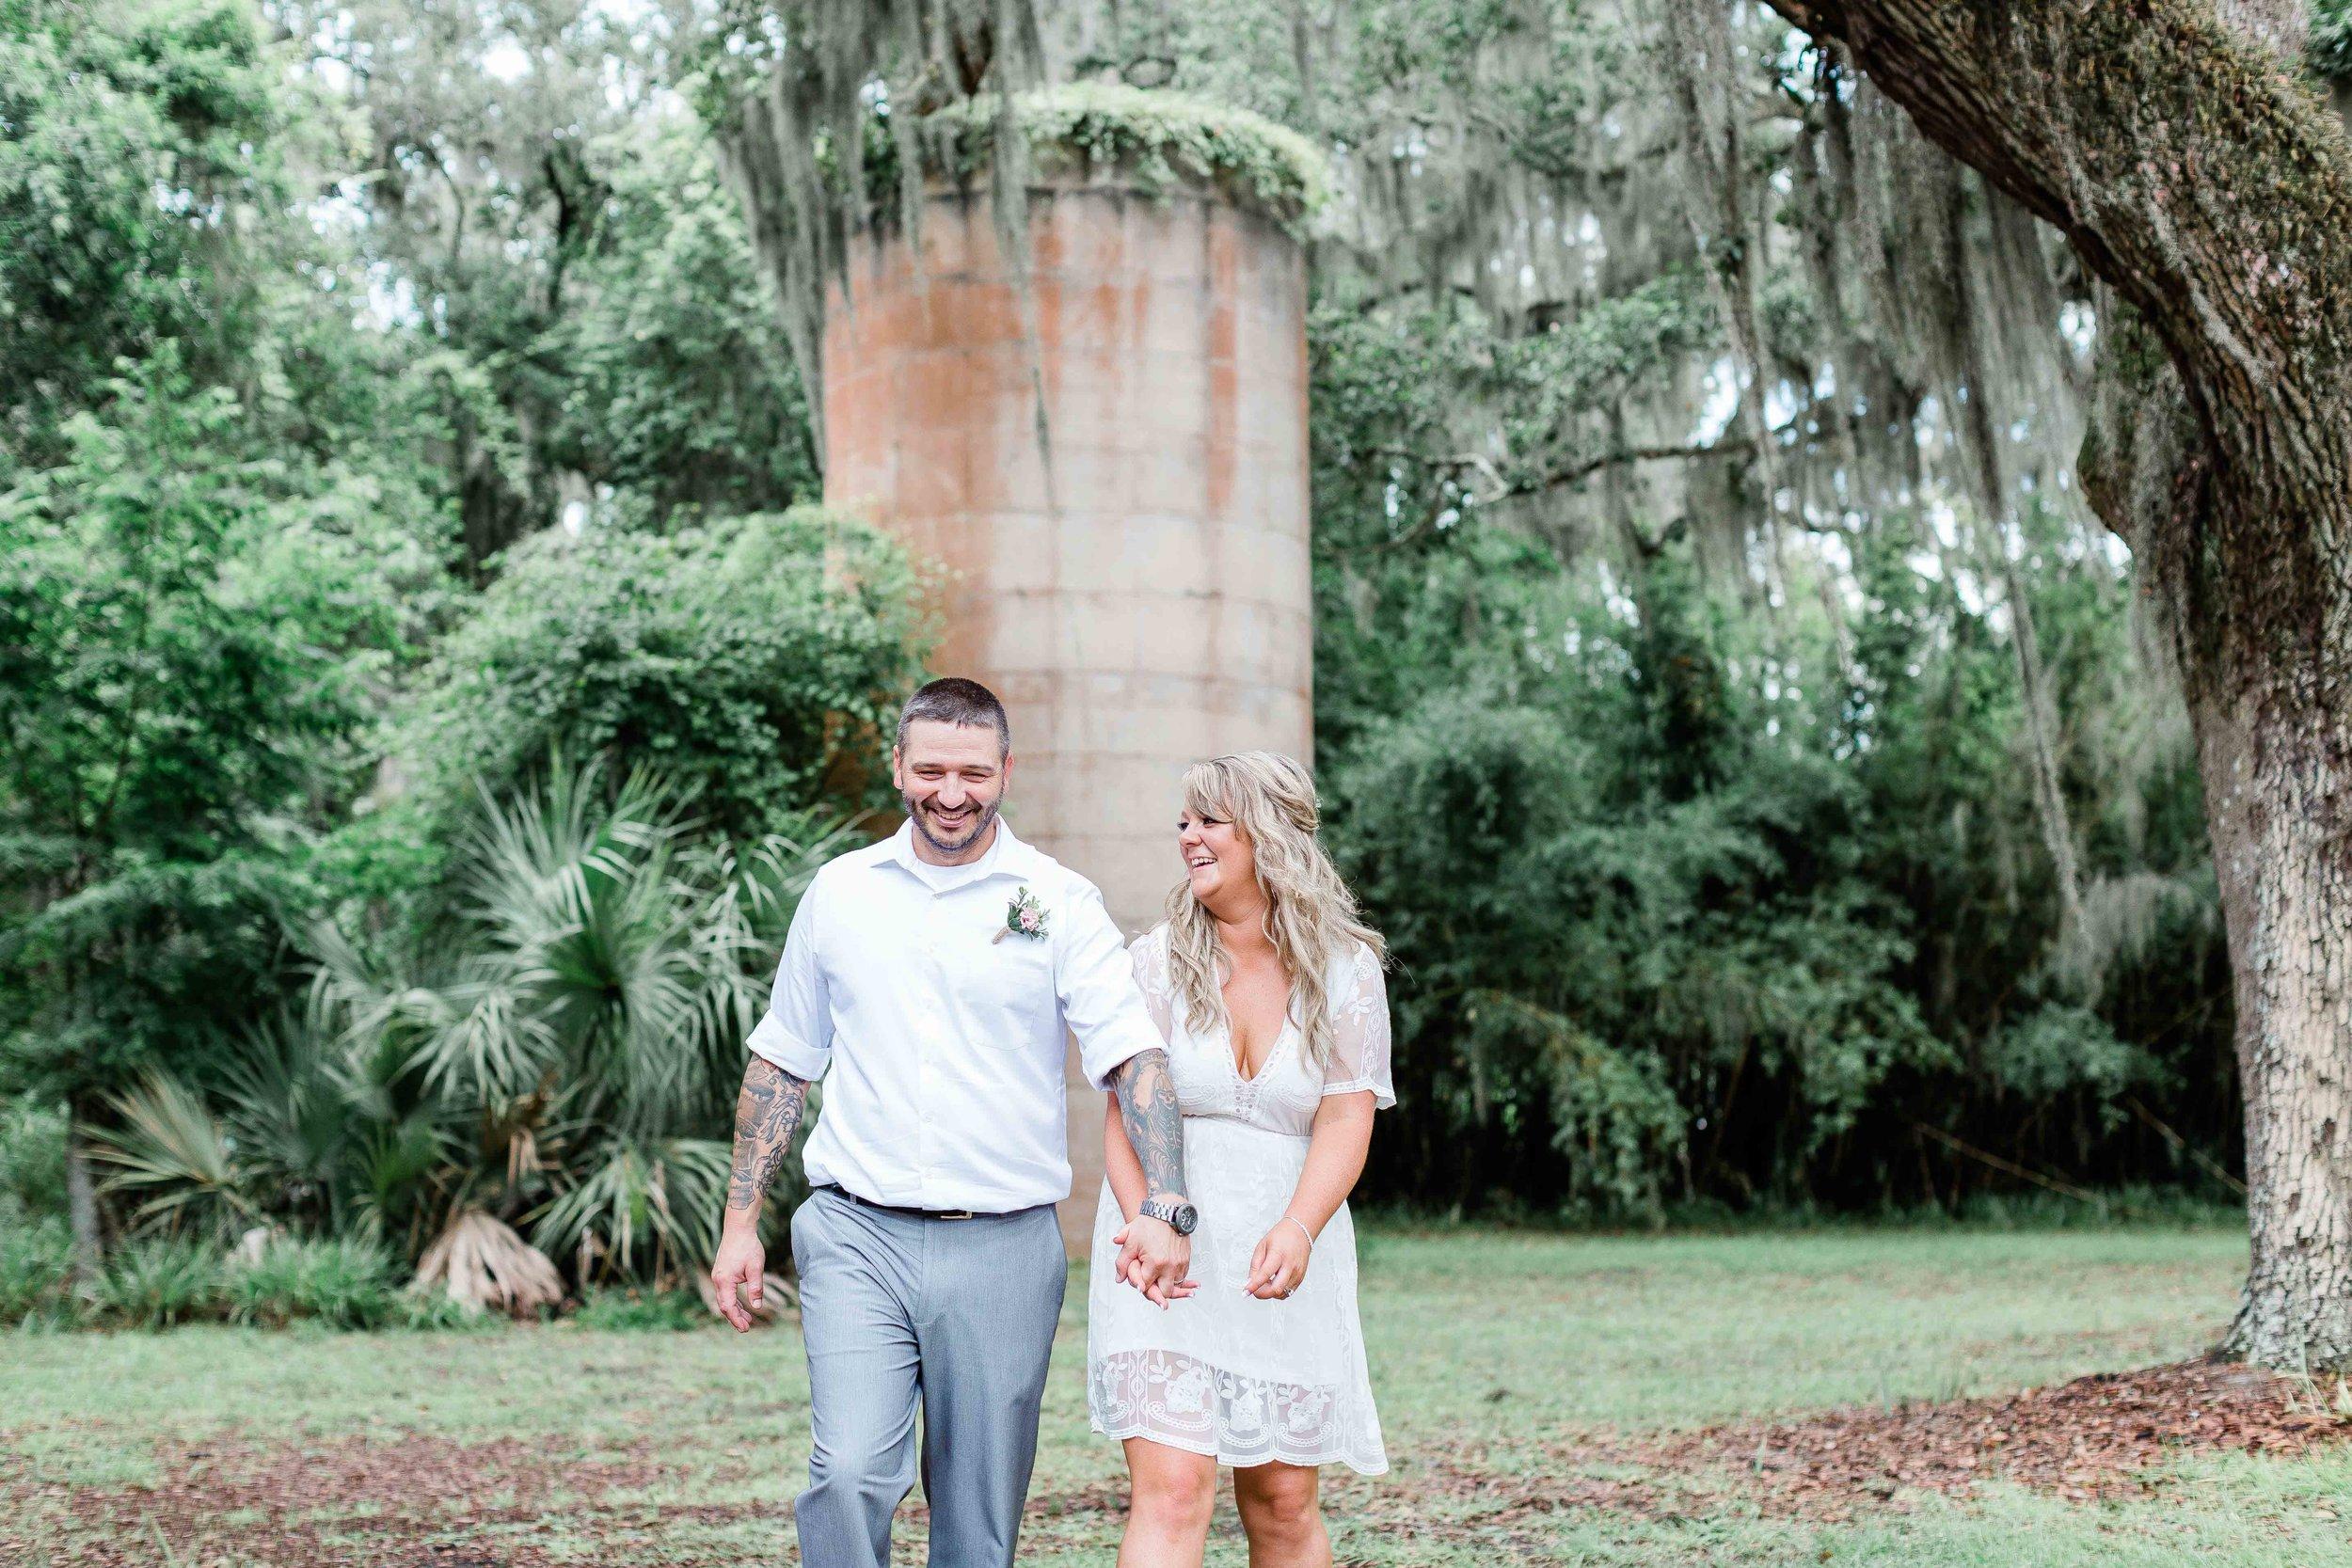 20190727Georgia-Wormlsoe Plantation-Simply Eloped-Savannah Wedding Photographer- Southern Lens Photography28.jpg